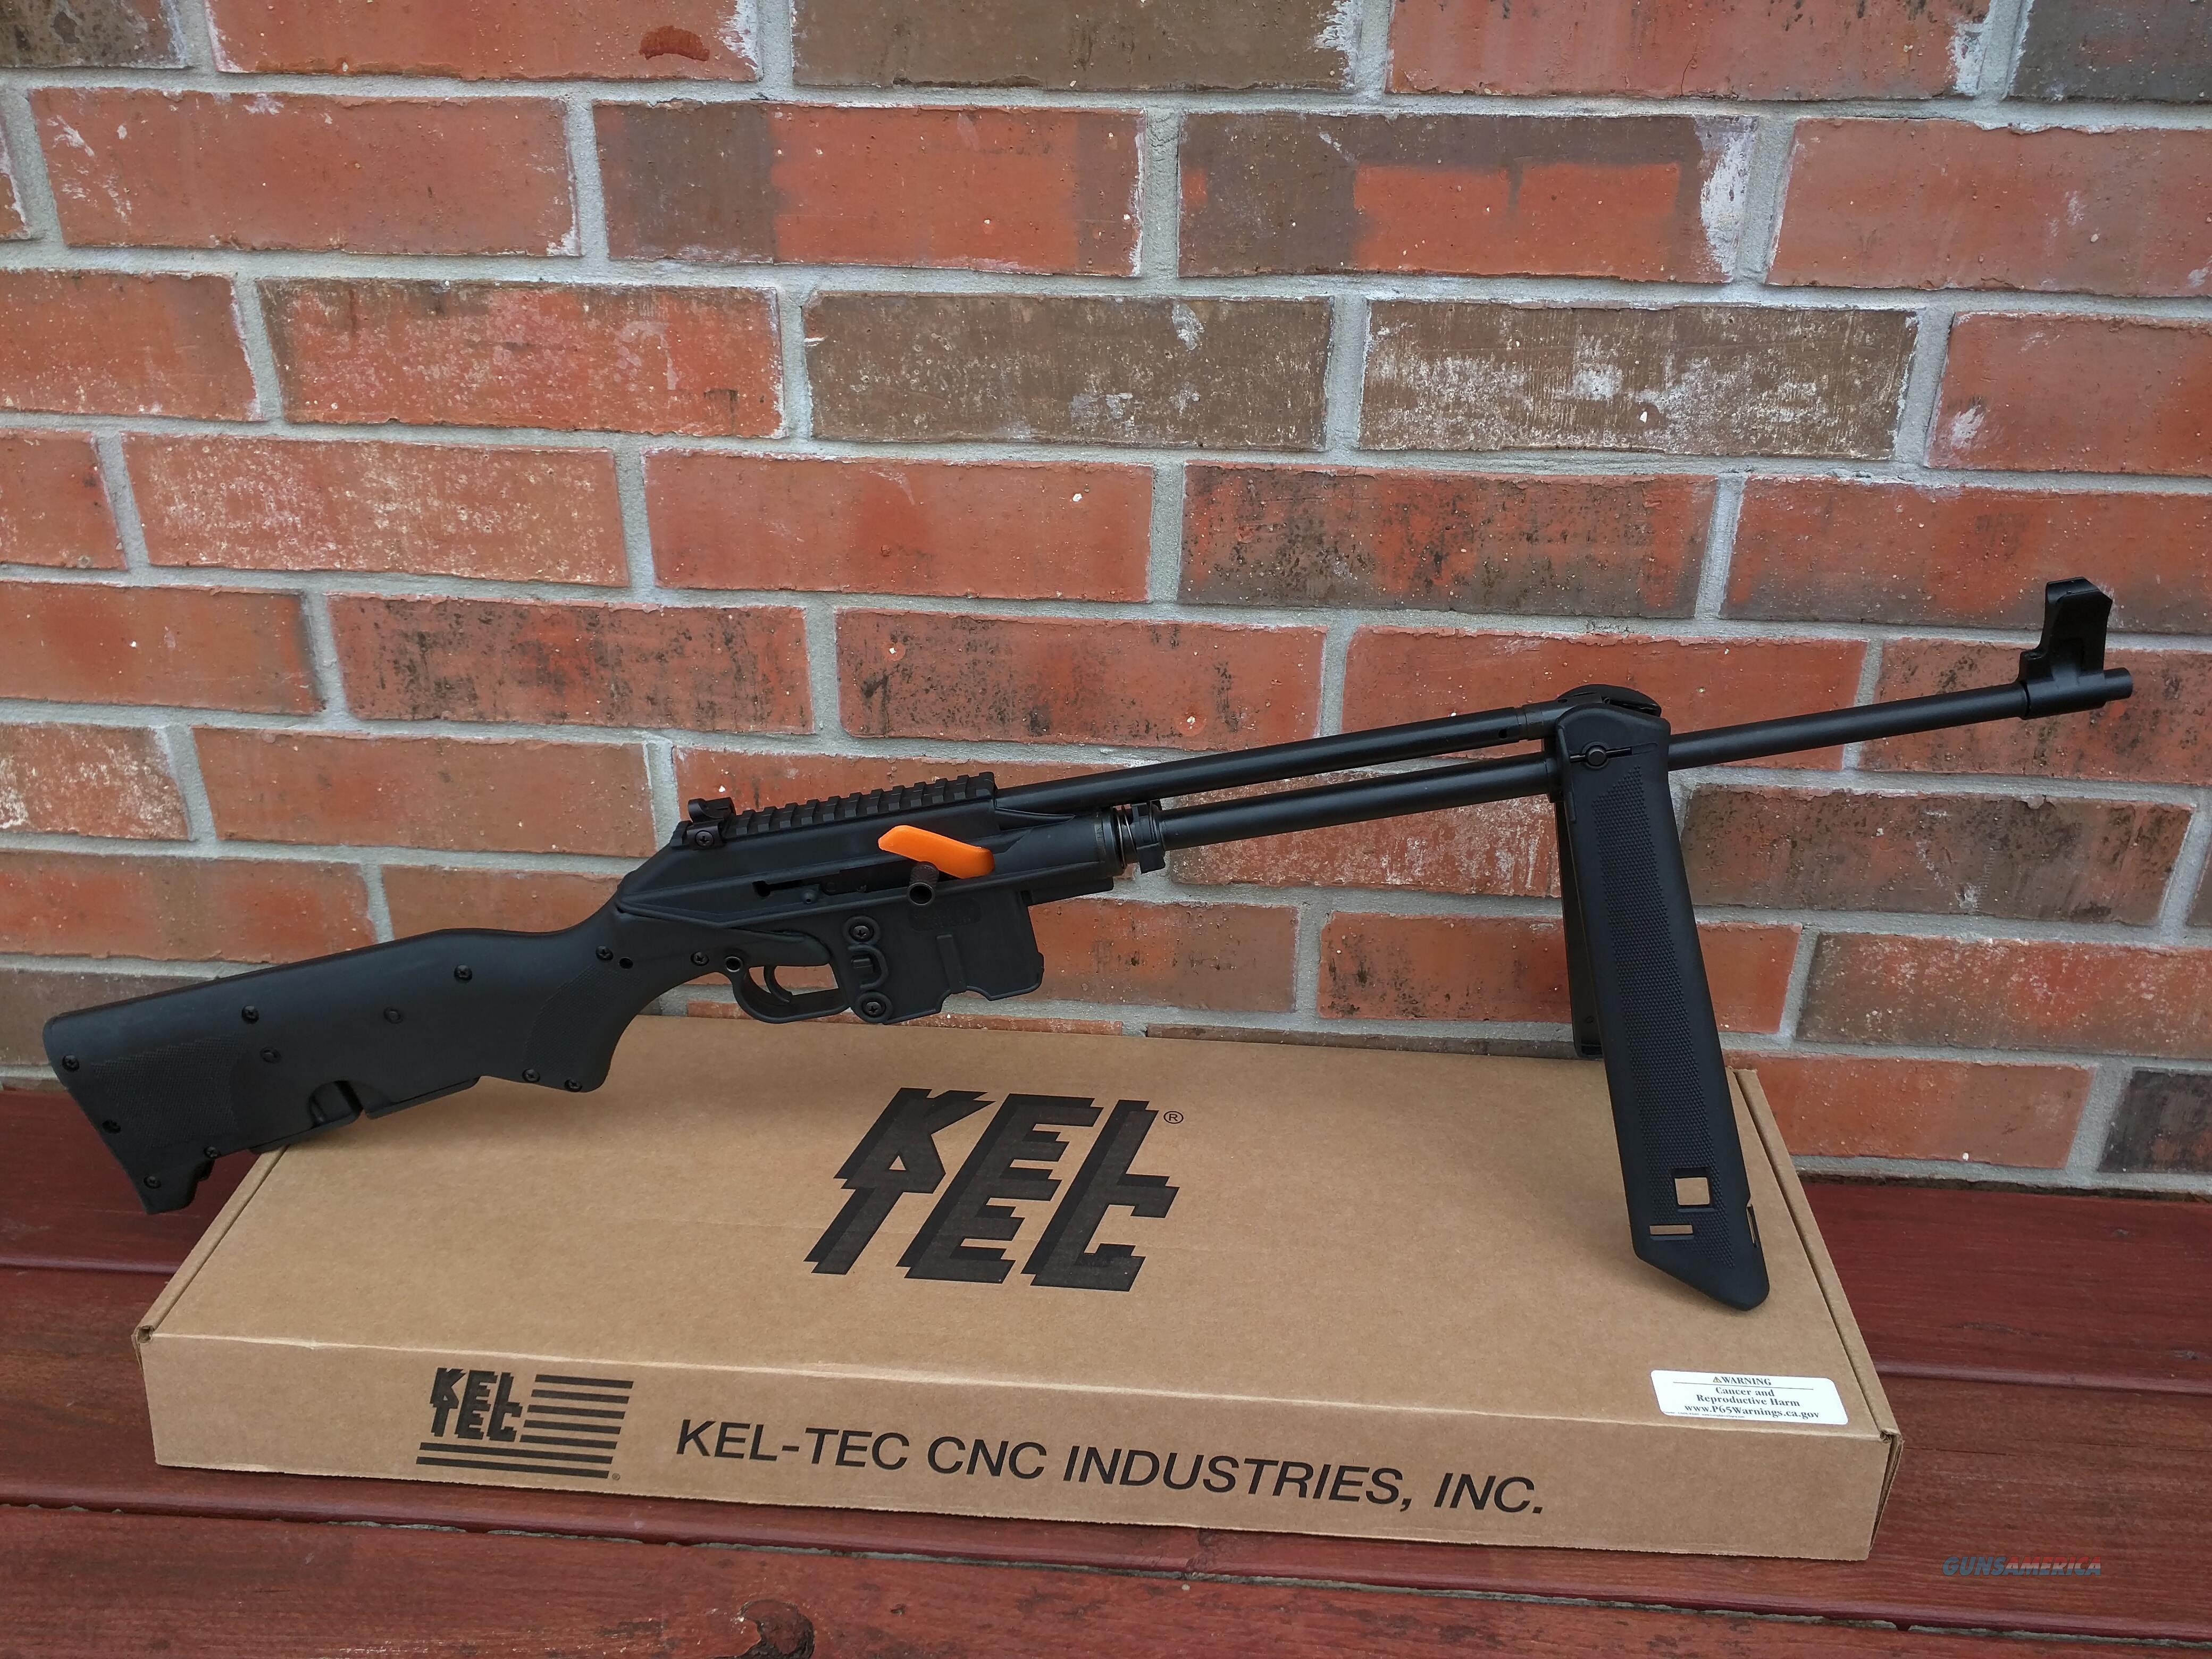 "Keltec Kel Tec SU16A Folding Rifle, 5.56/223, built in bi-pod, 16"", Iron sights and flat top, takes all AR 15 magazines, lightweight only 4.7lb, NIB FREE Layaway  Guns > Rifles > AR-15 Rifles - Small Manufacturers > Complete Rifle"